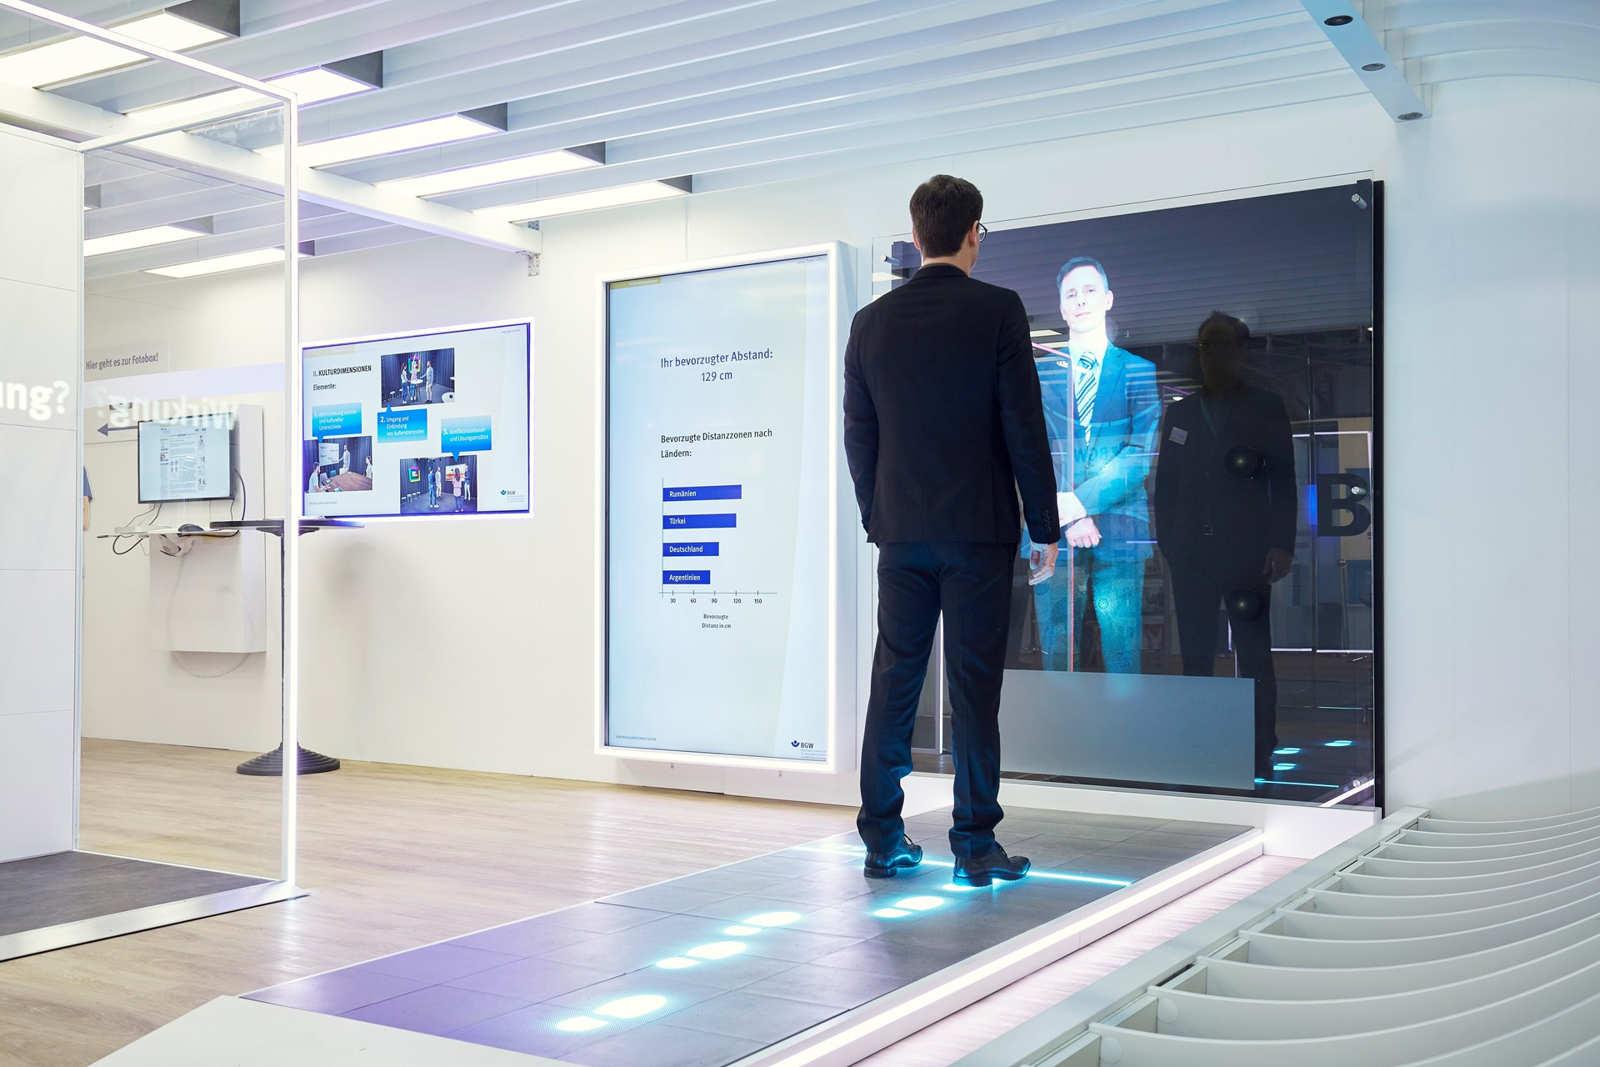 floor-led-display-screen-for-bontempo-4